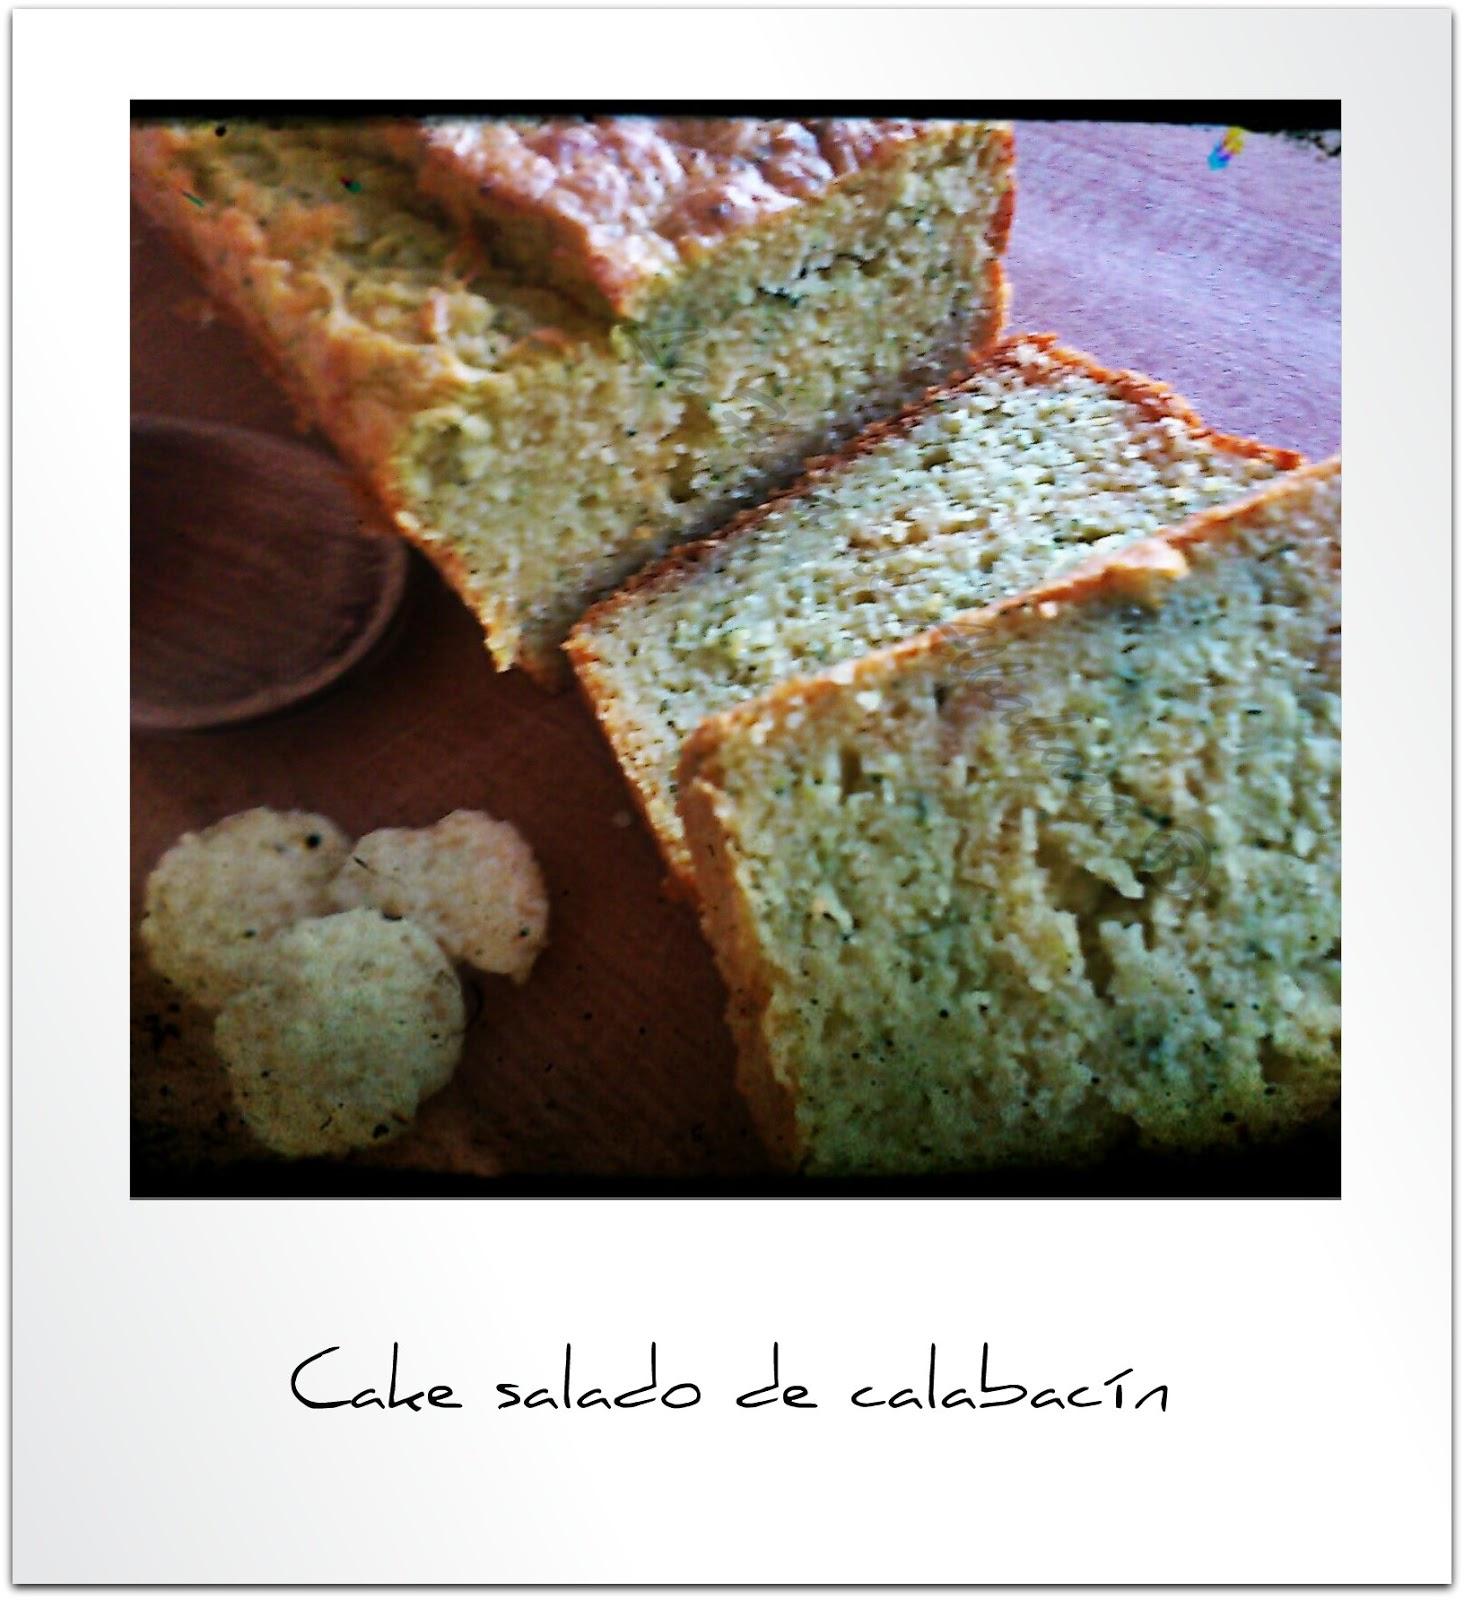 cake de calabacín, calabacín, grok, parmesano